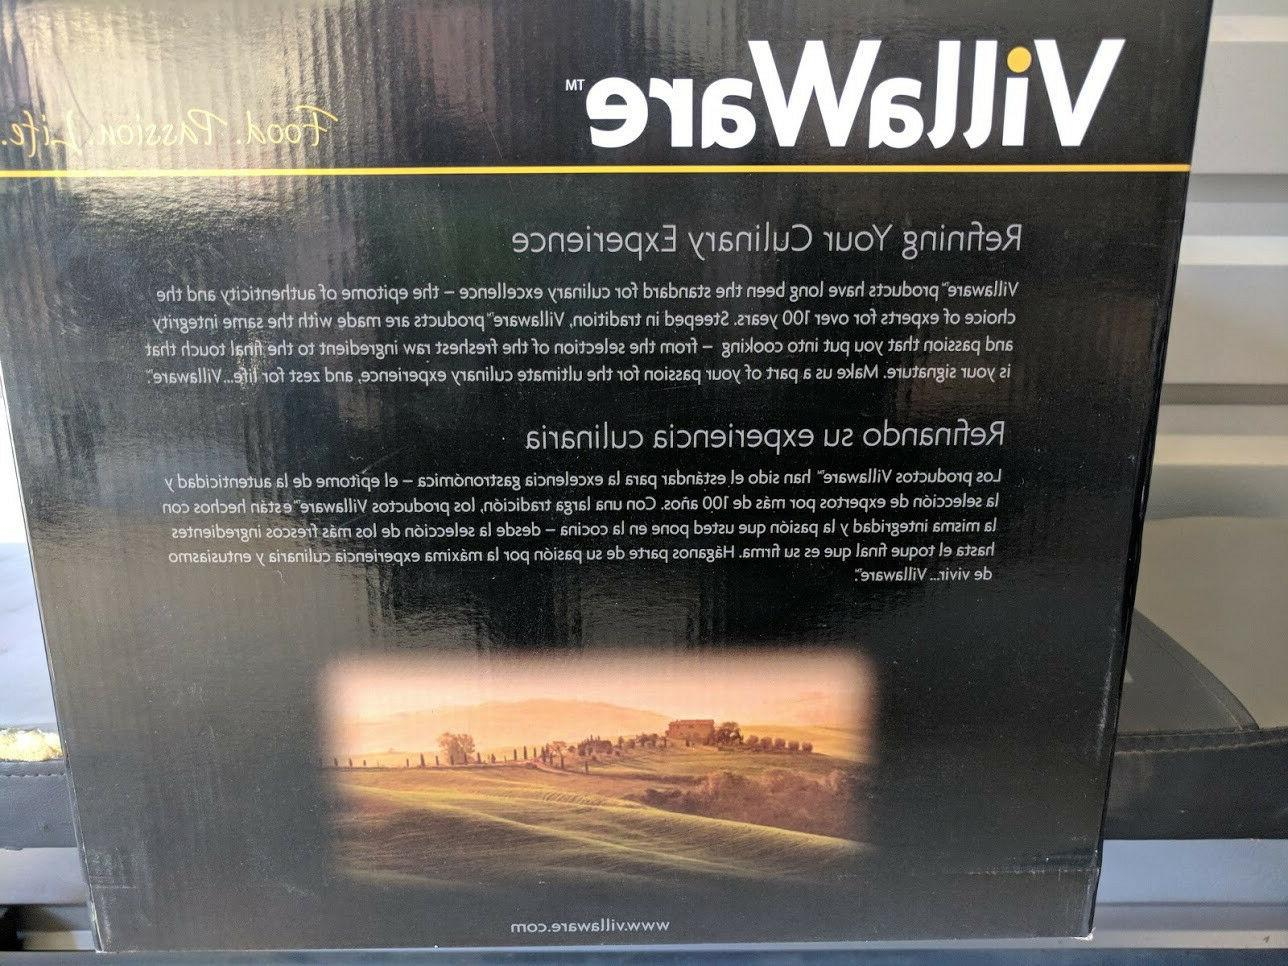 VillaWare New Stainless Steel VillaWare Food Blender